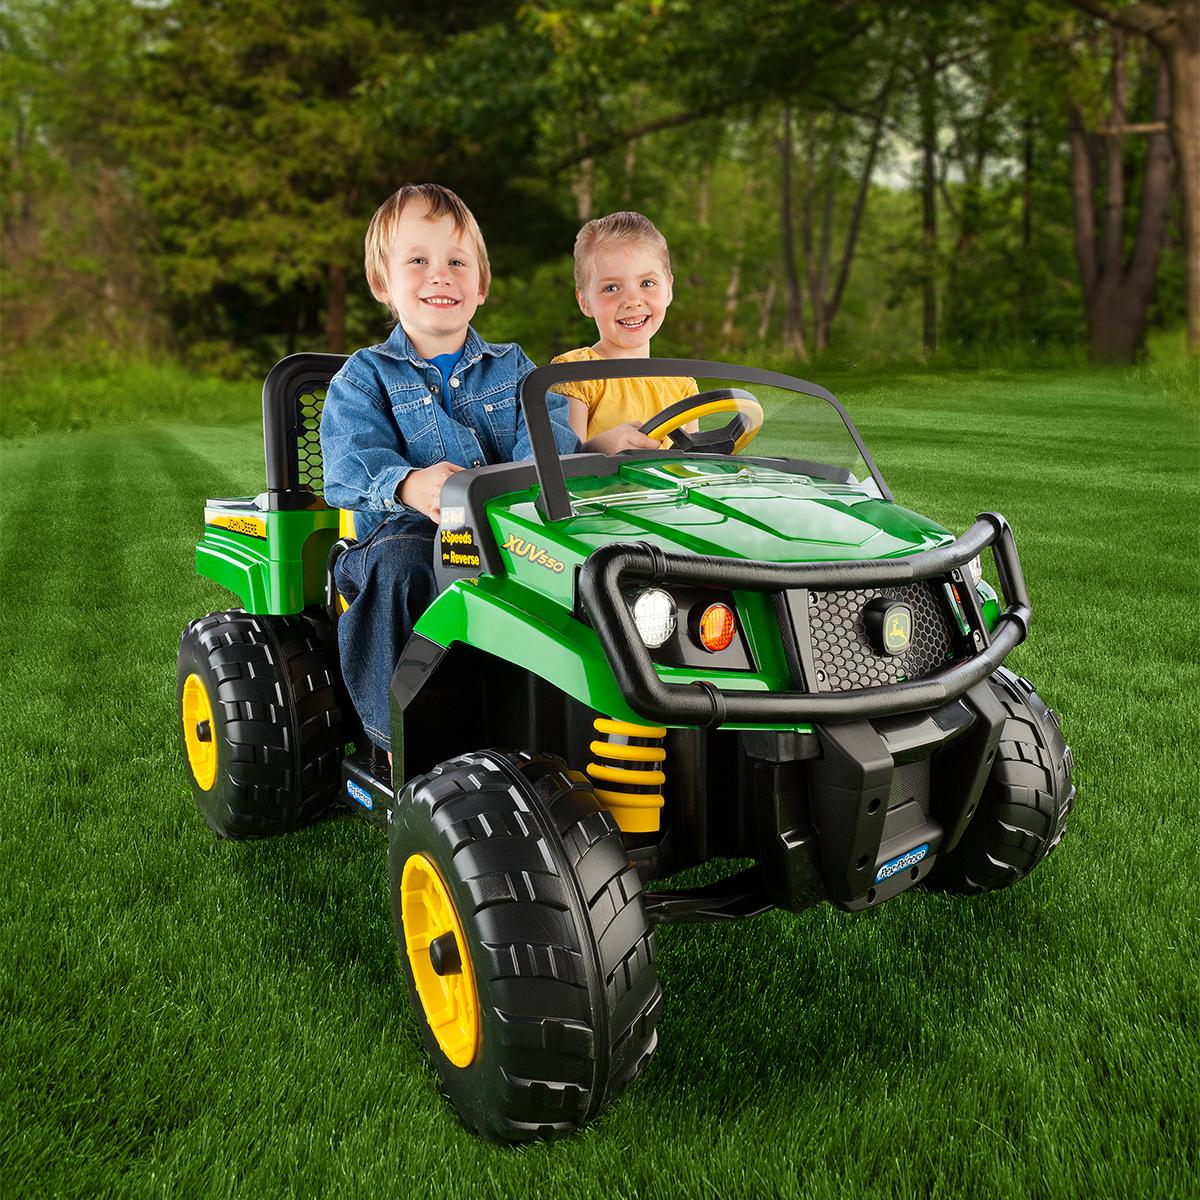 John Deere Power Wheels : Amazon peg perego john deere gator xuv green toys